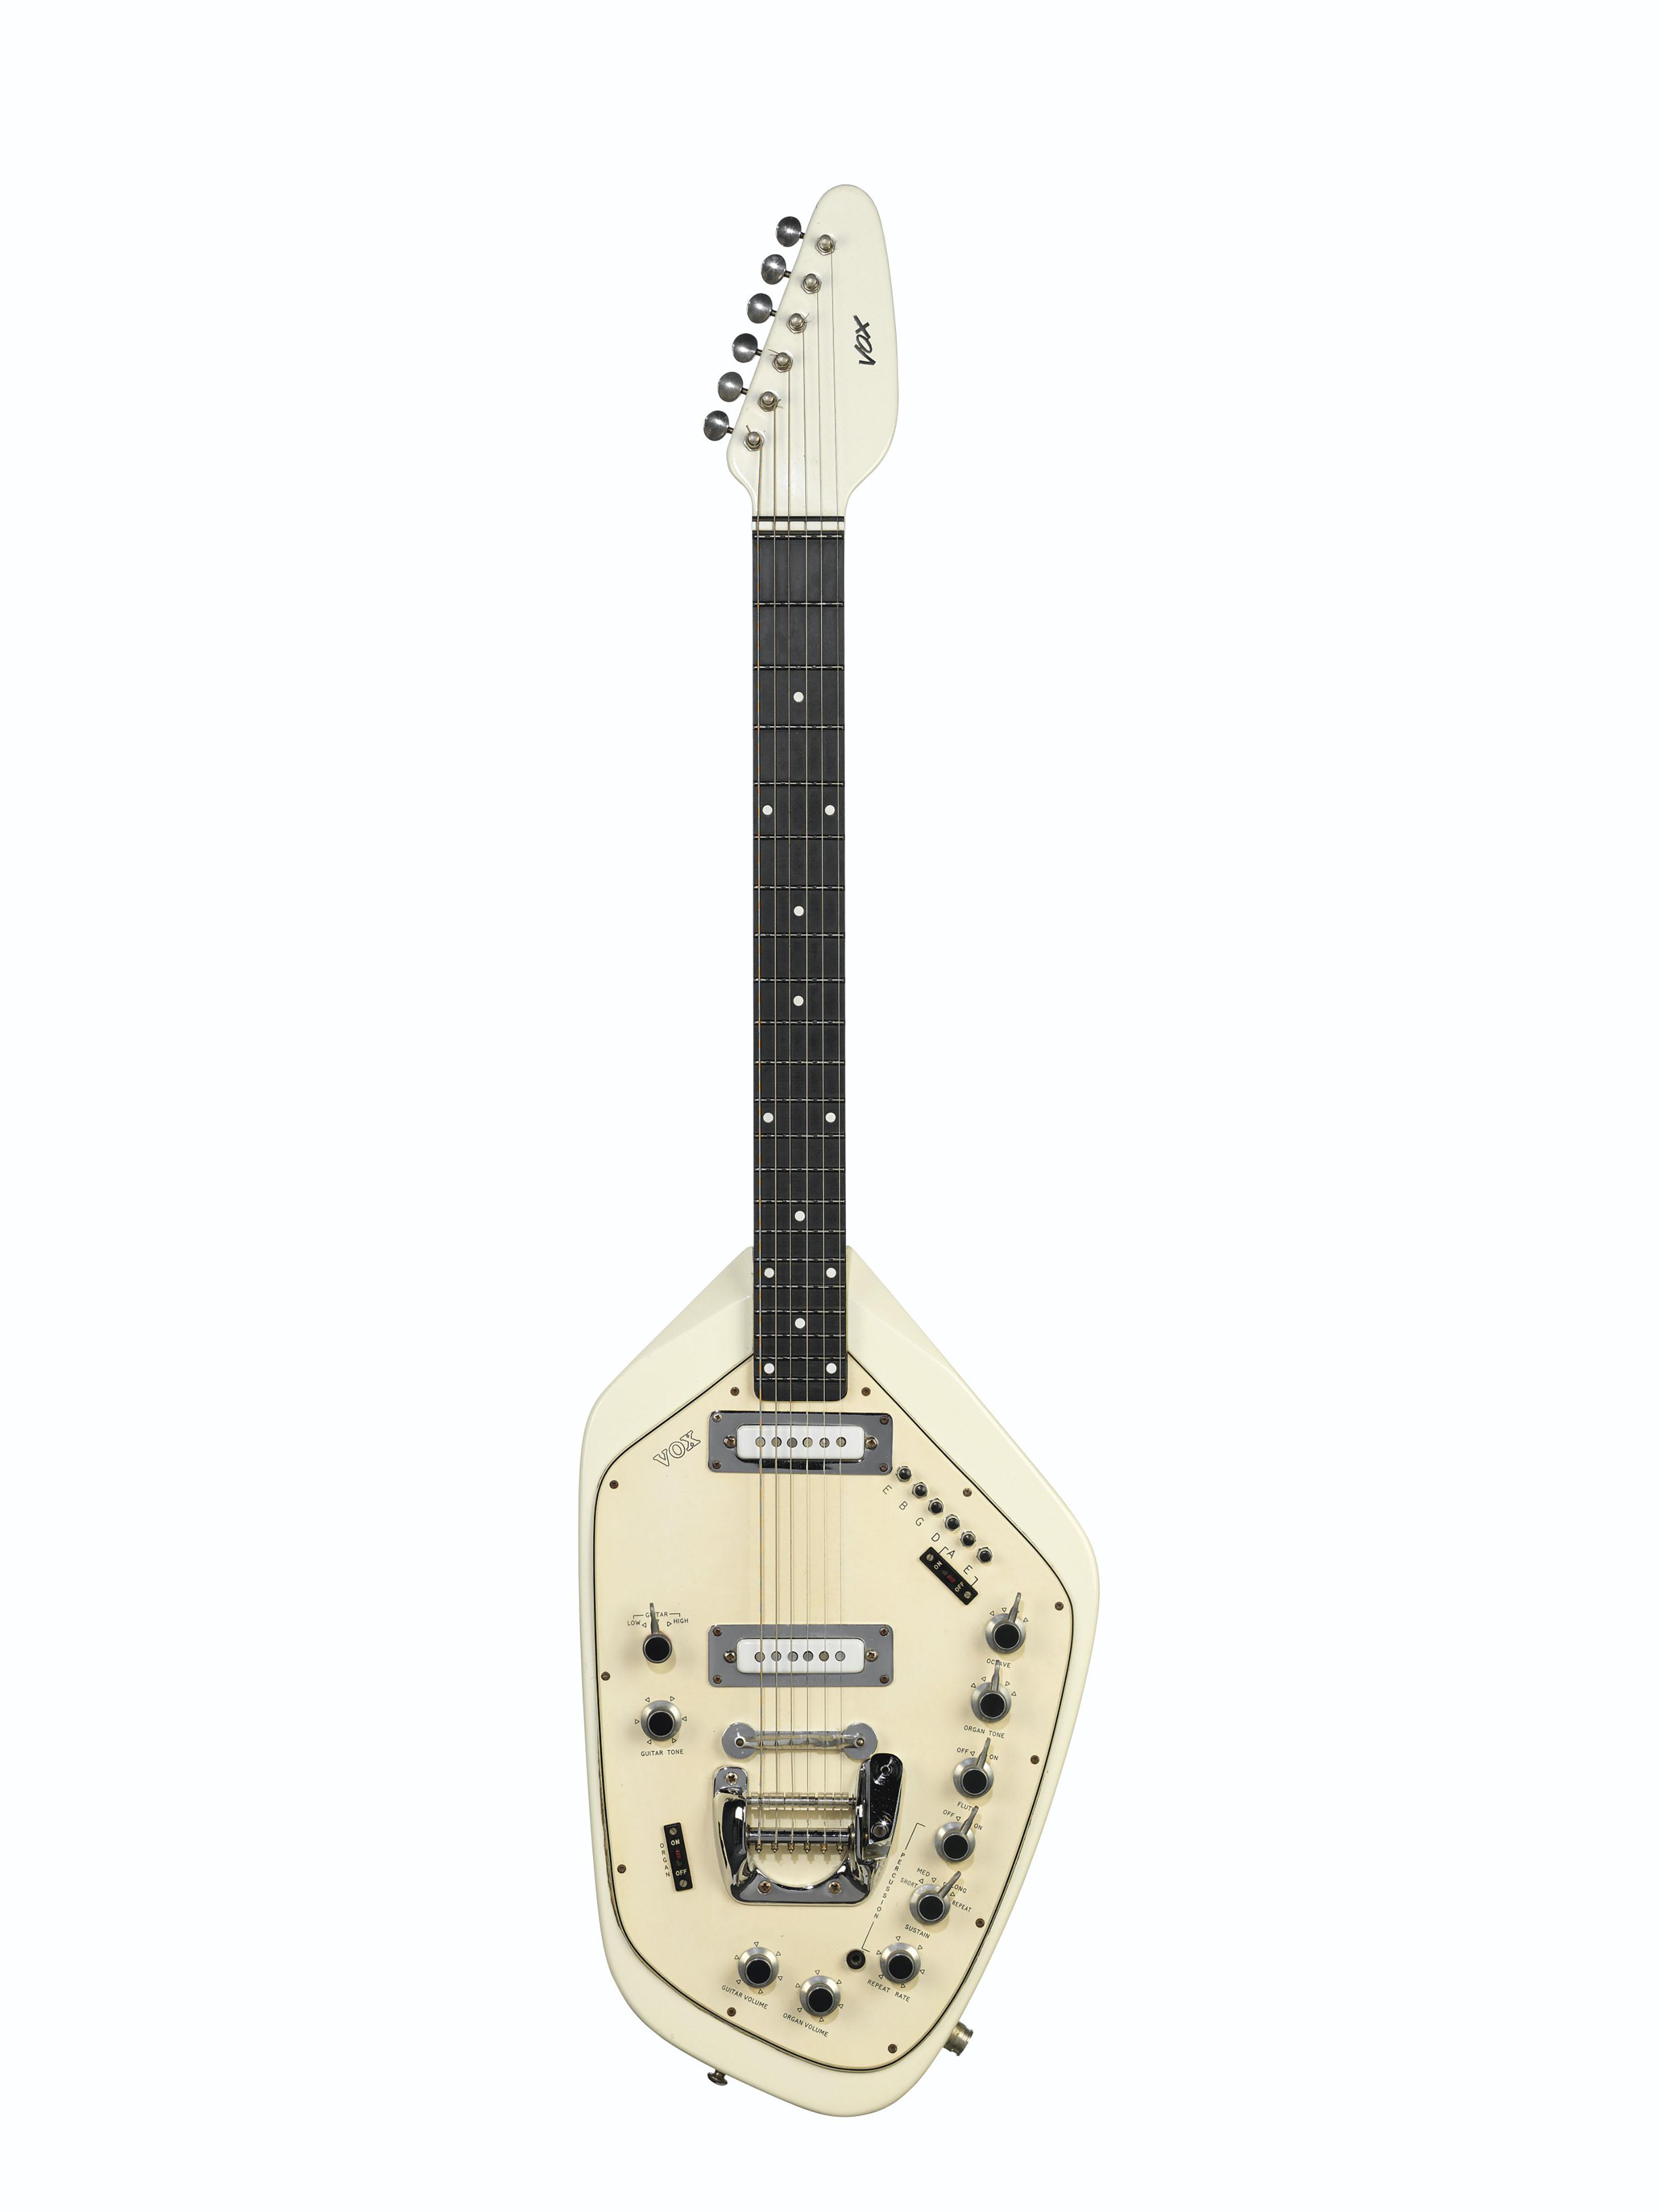 JENNINGS MUSICAL INSTRUMENTS LIMITED, DARTFORD, 1967